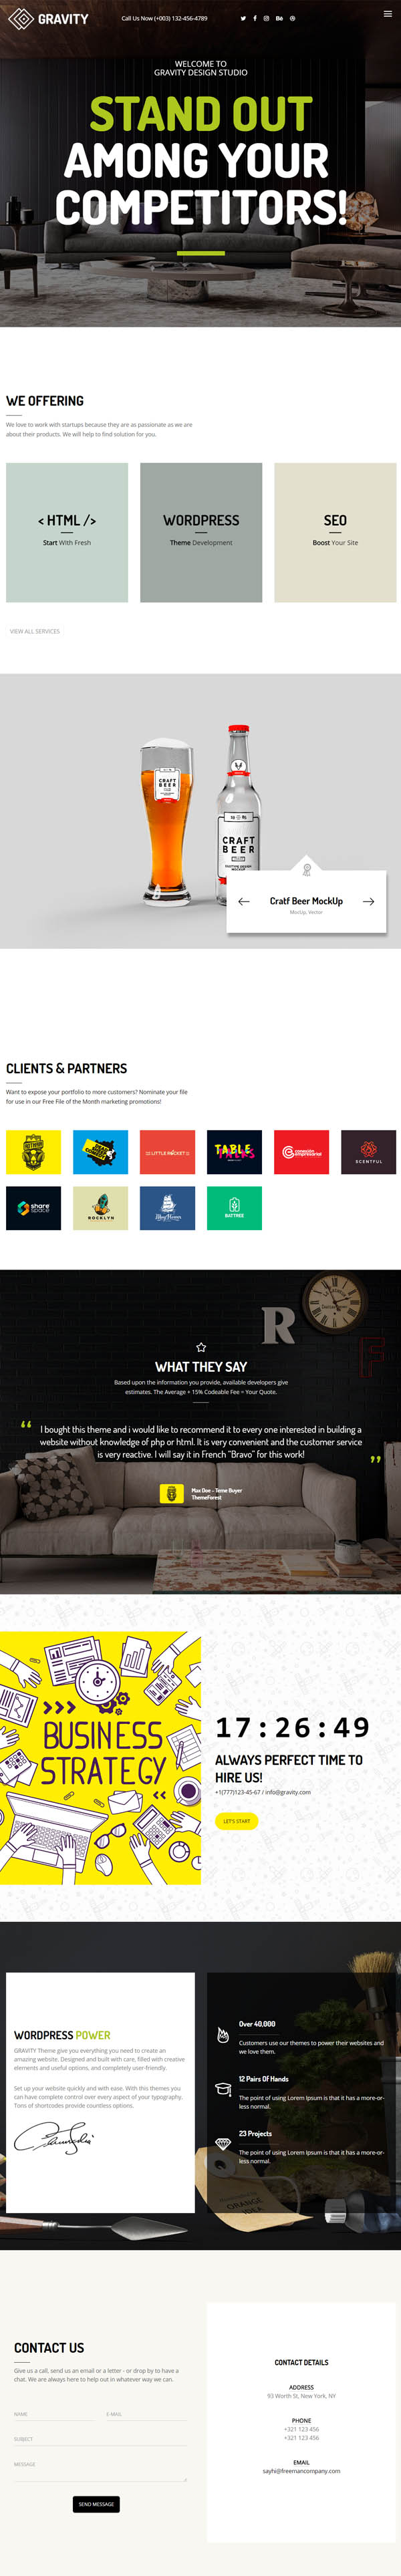 Gravity – Creative Agency & Presentation Theme